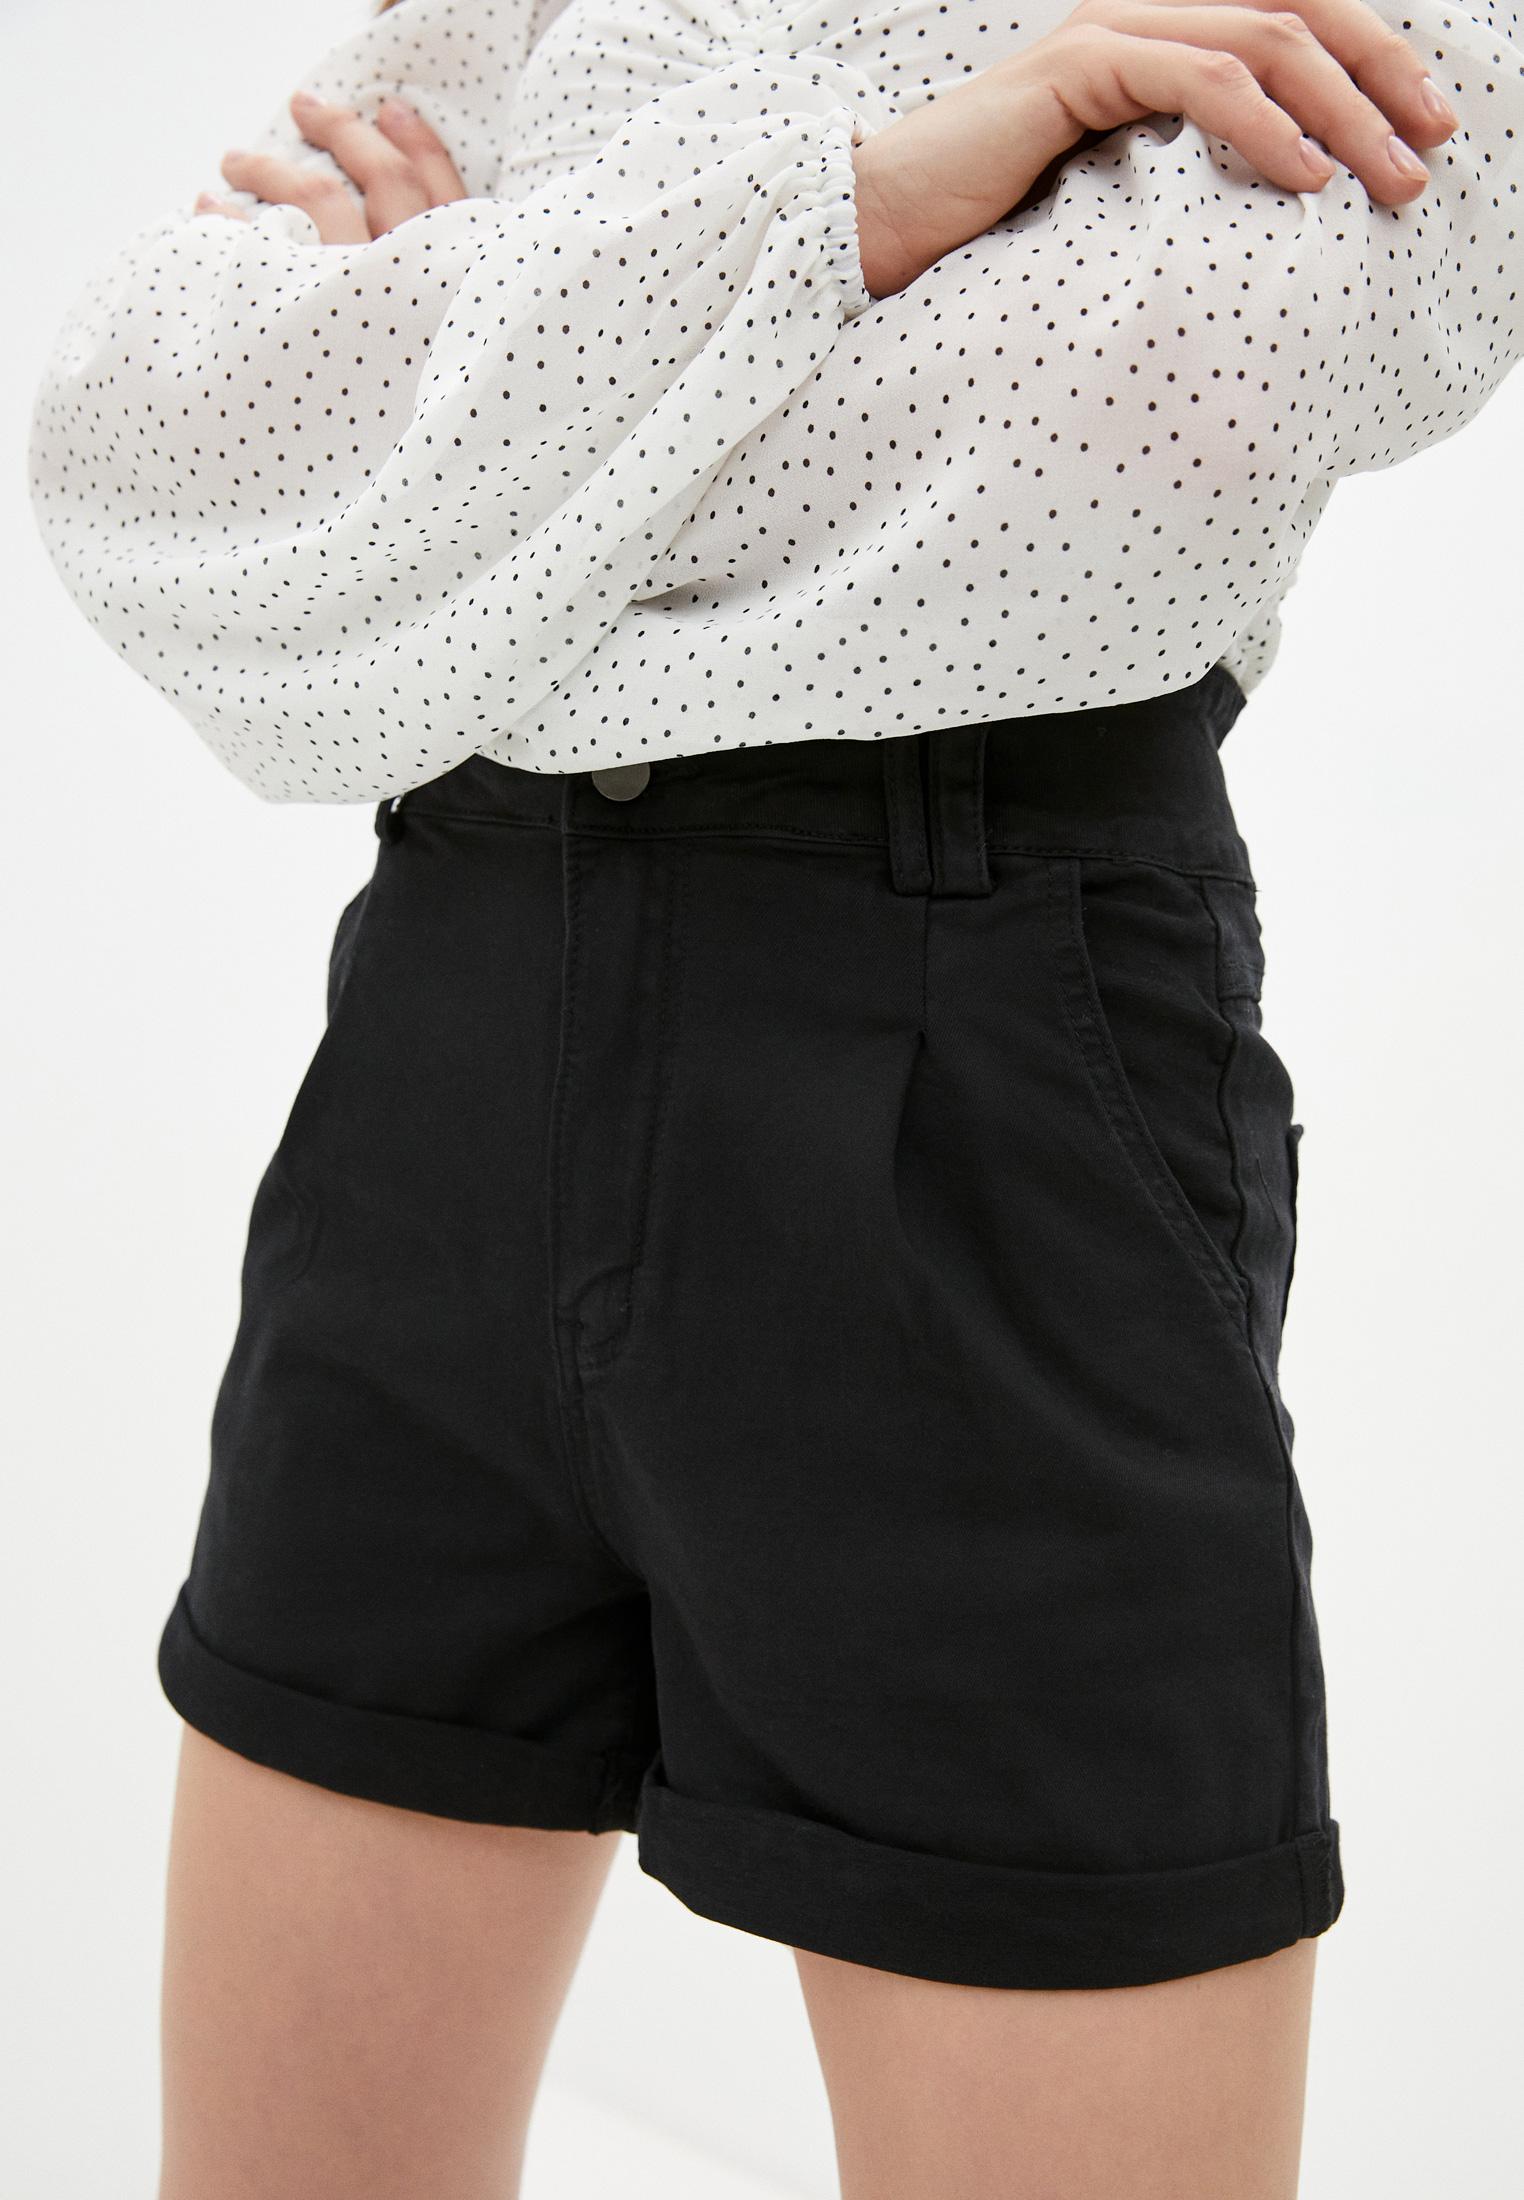 Женские повседневные шорты G&G Шорты G&G